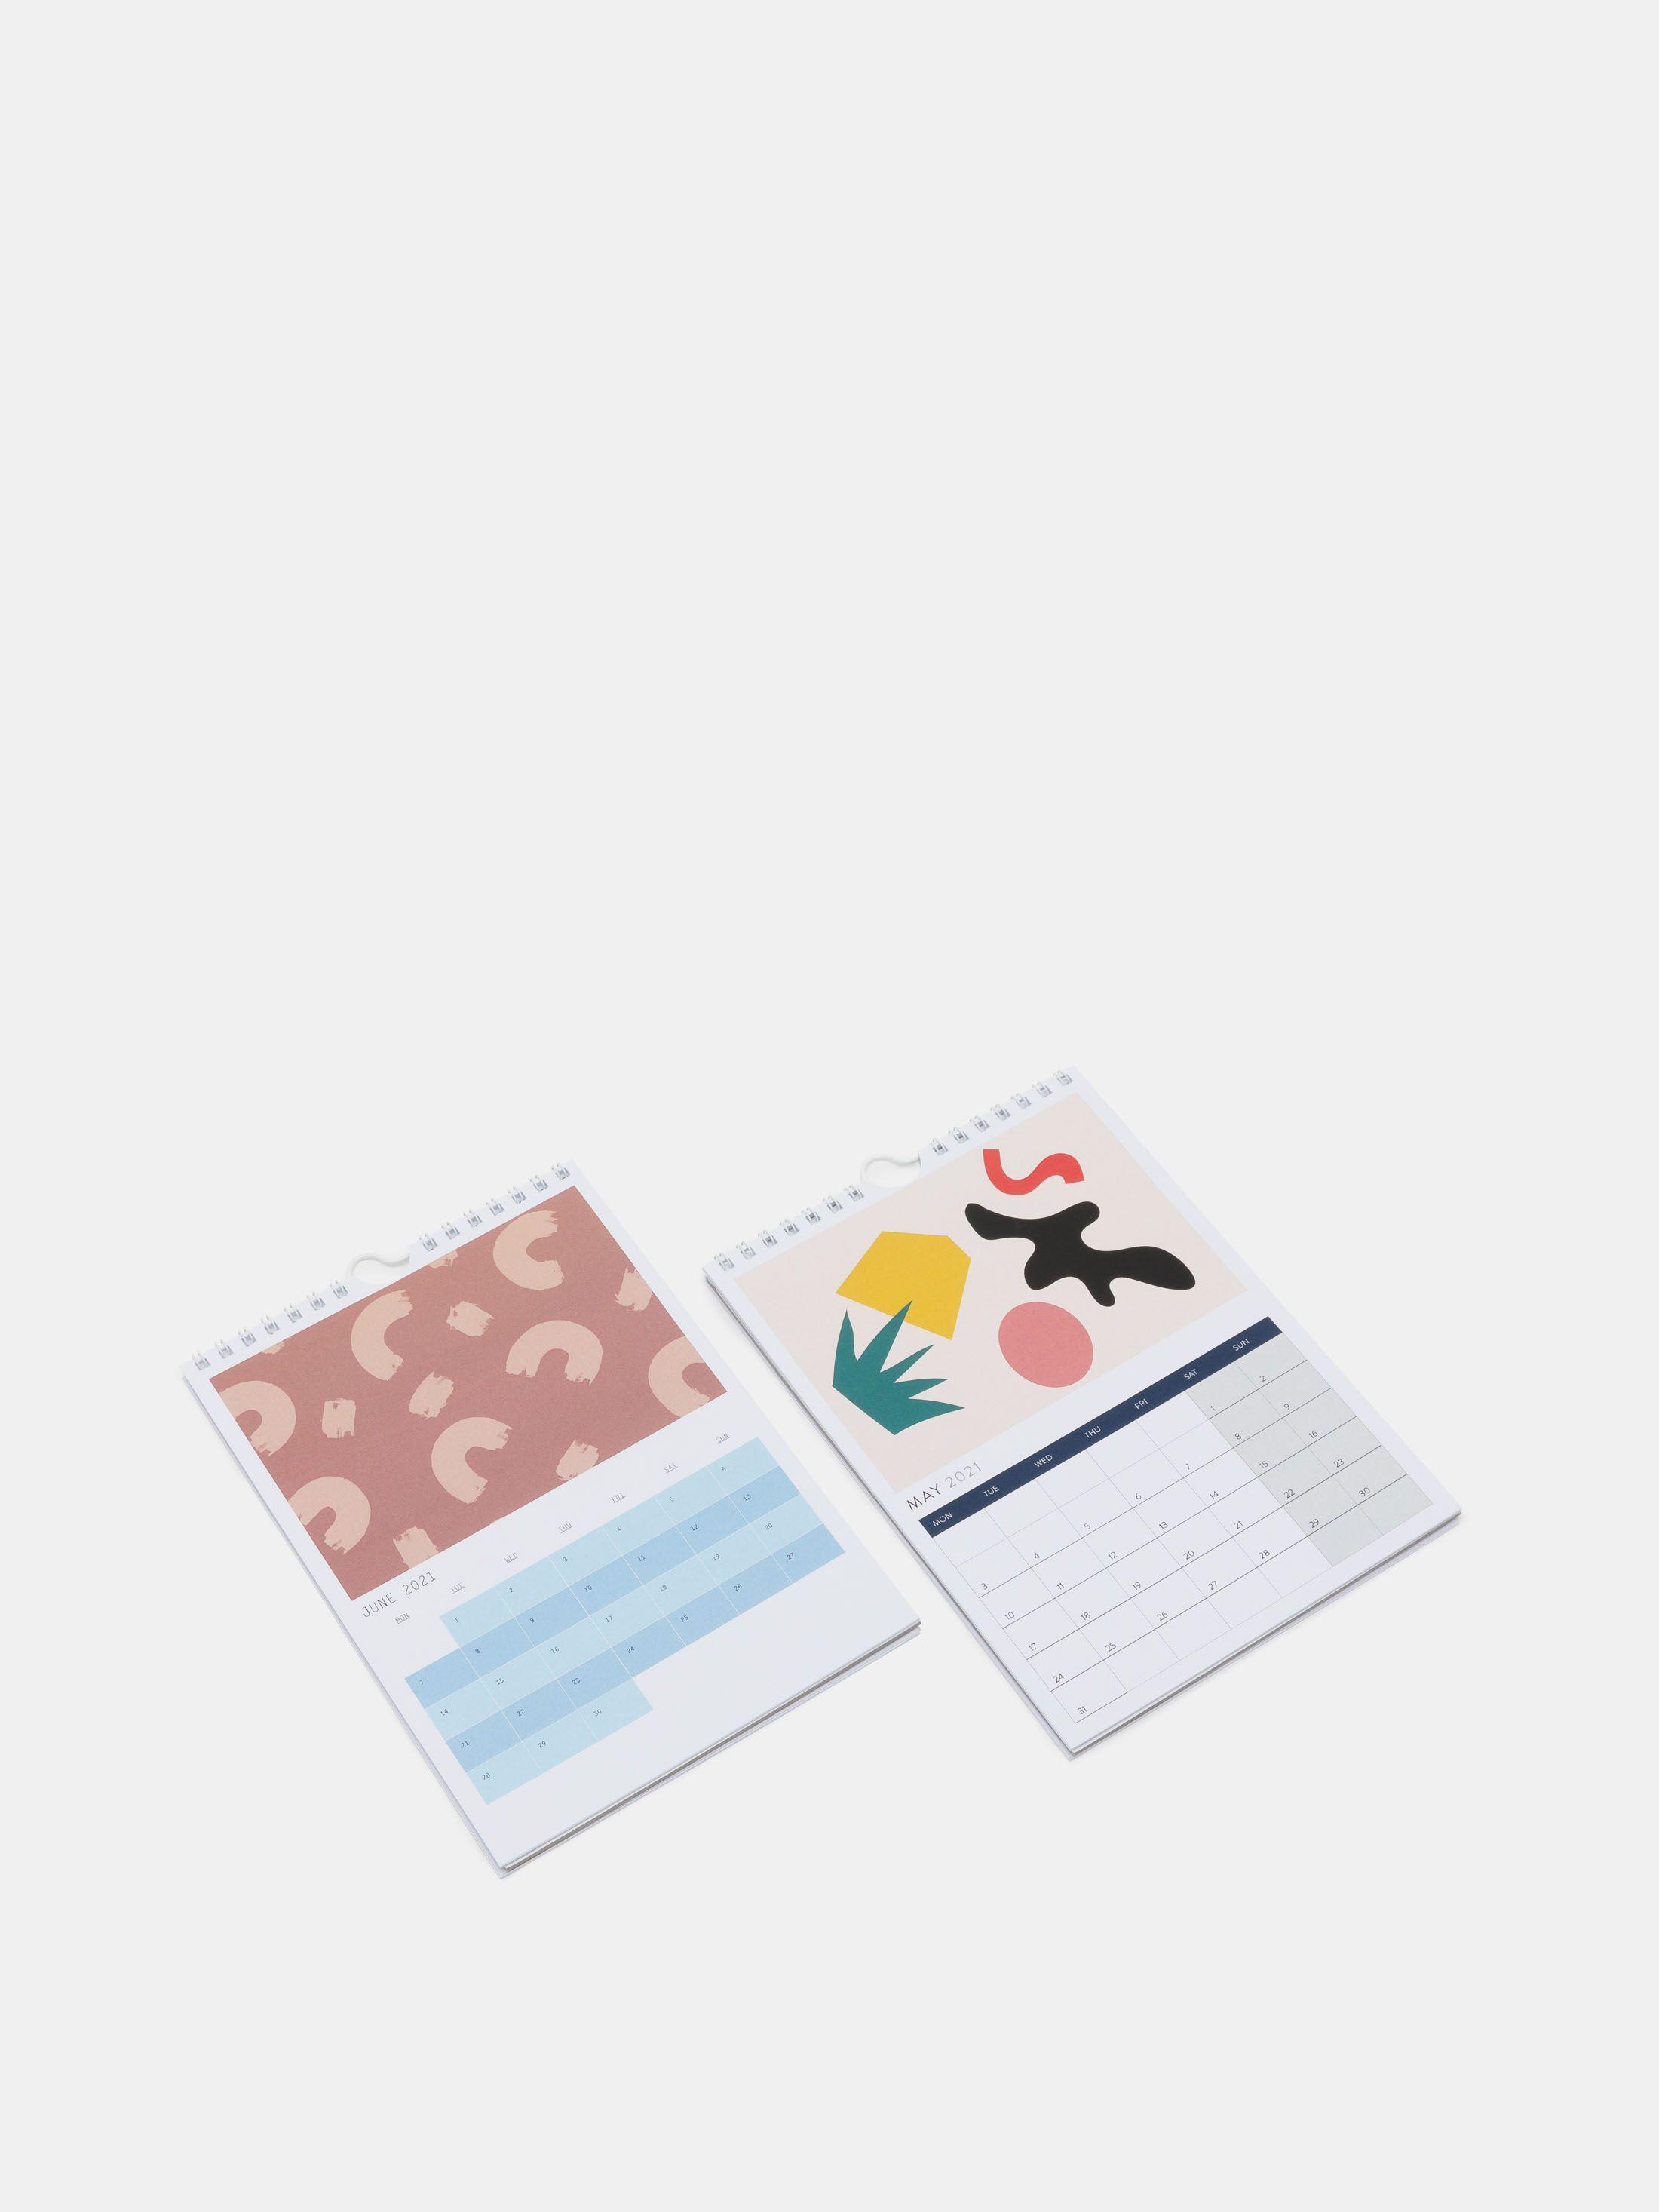 design your own calendar 2021 UK